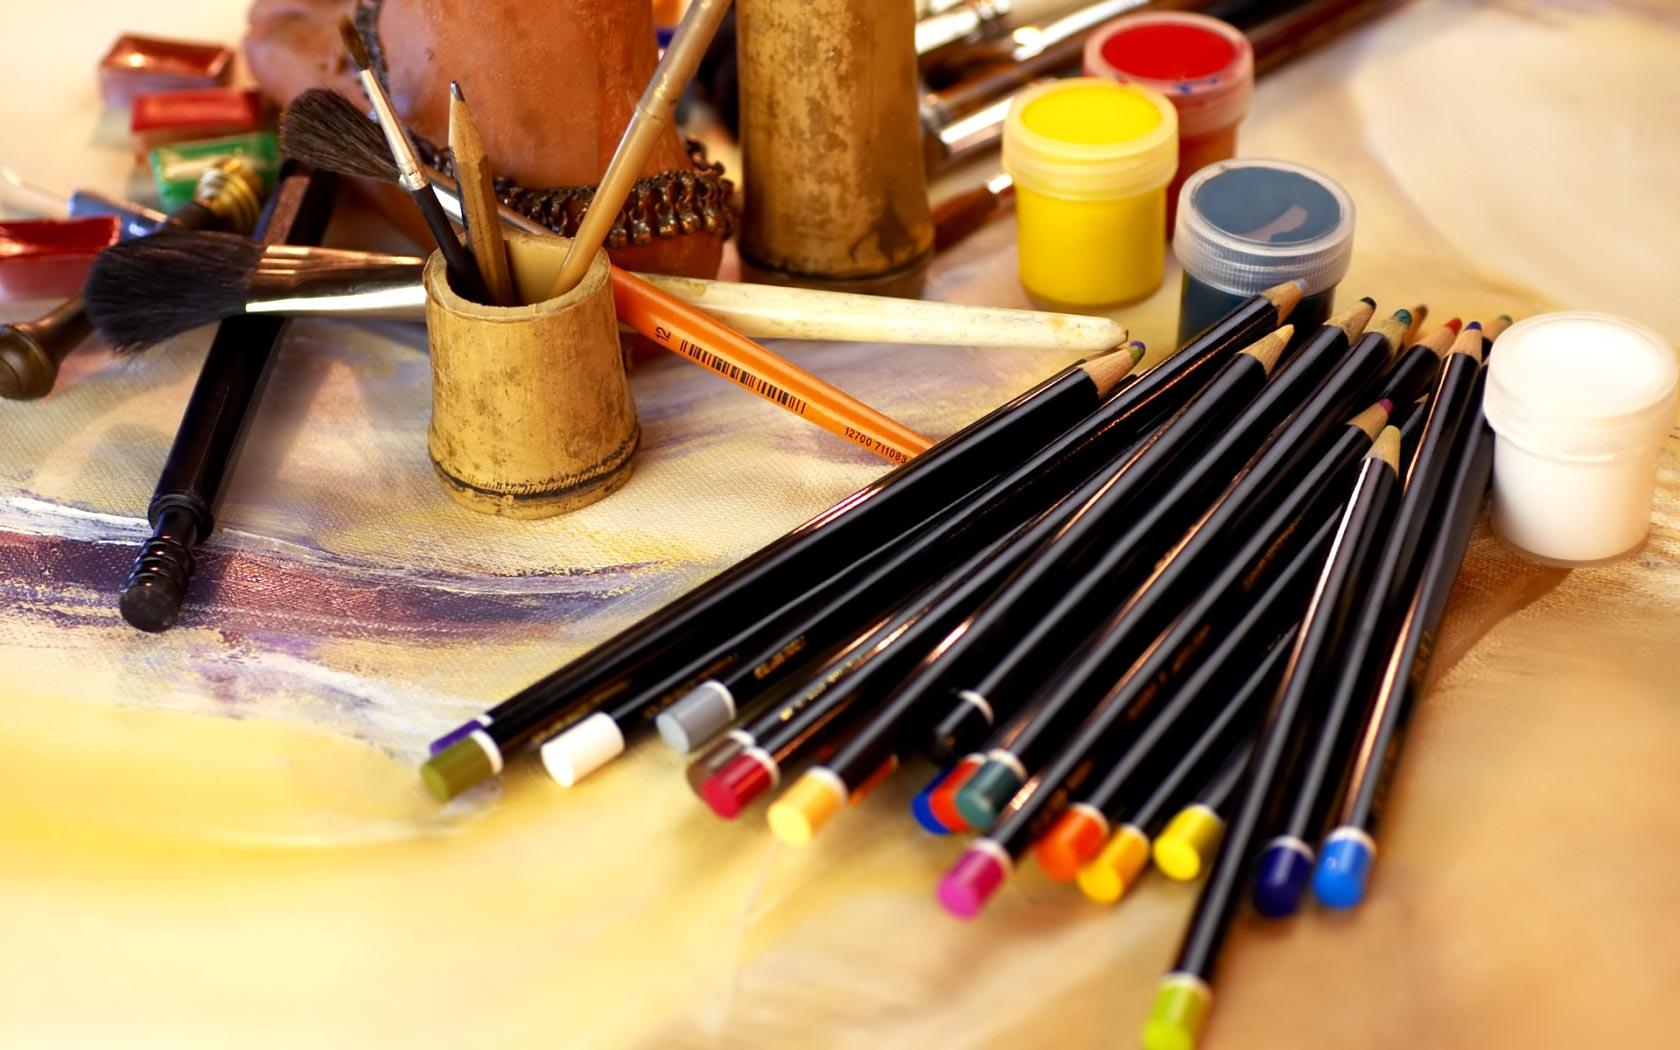 4 struggles of a self proclaimed artist